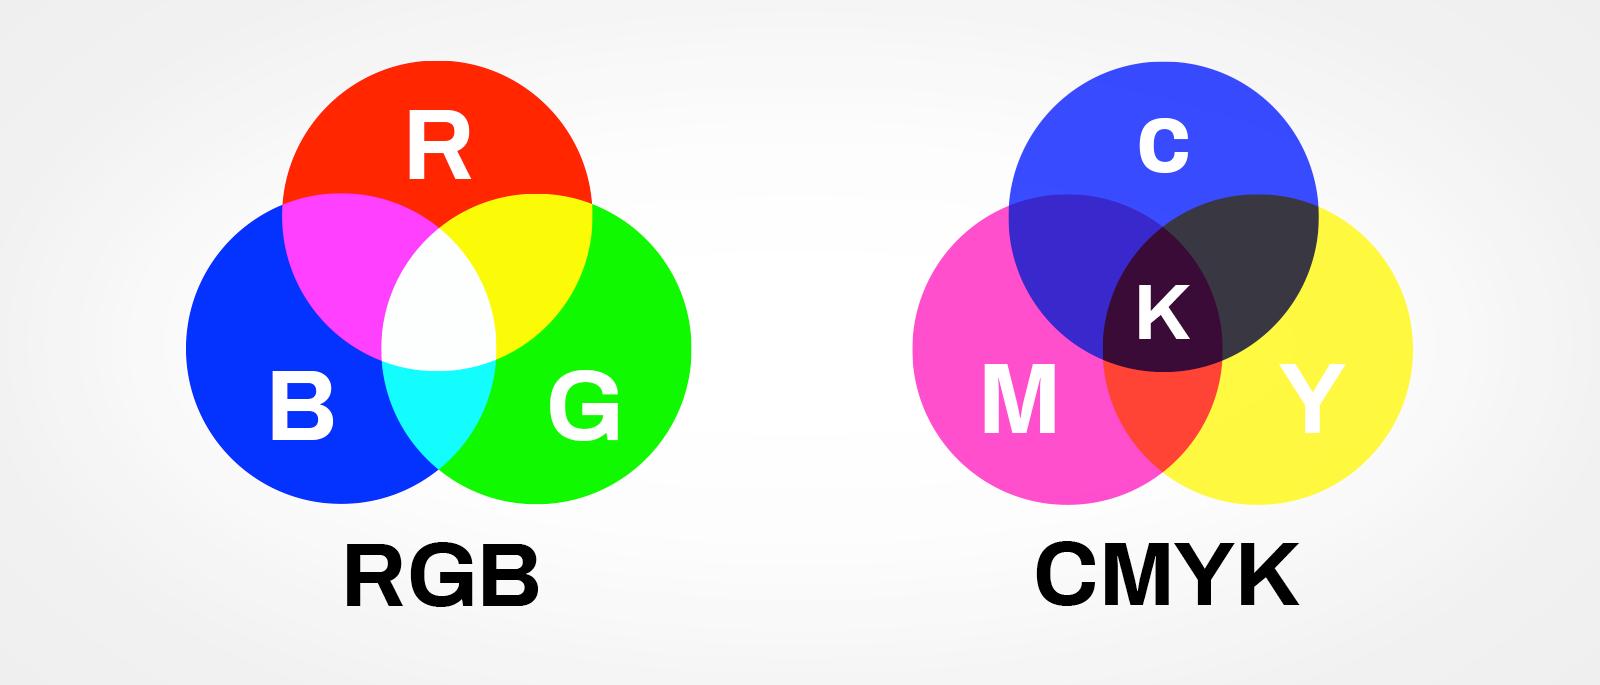 cms/blog/RGB_-_POD_Glossary_-_SPOD